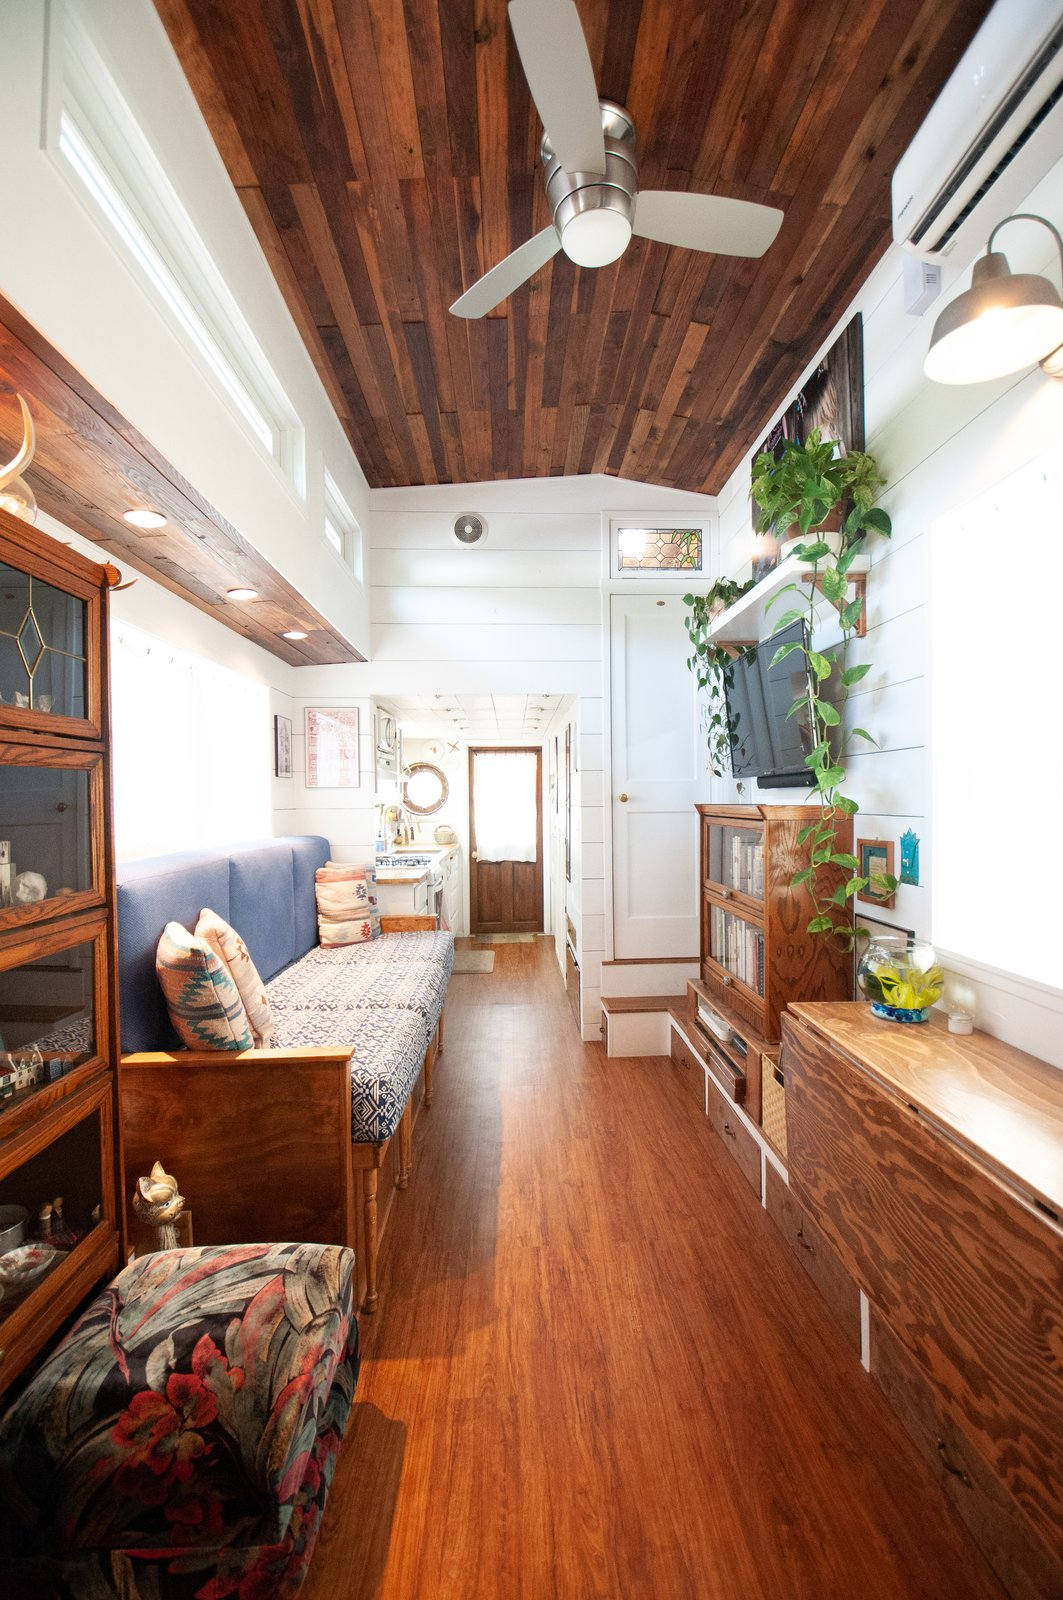 Her Tiny Home interior